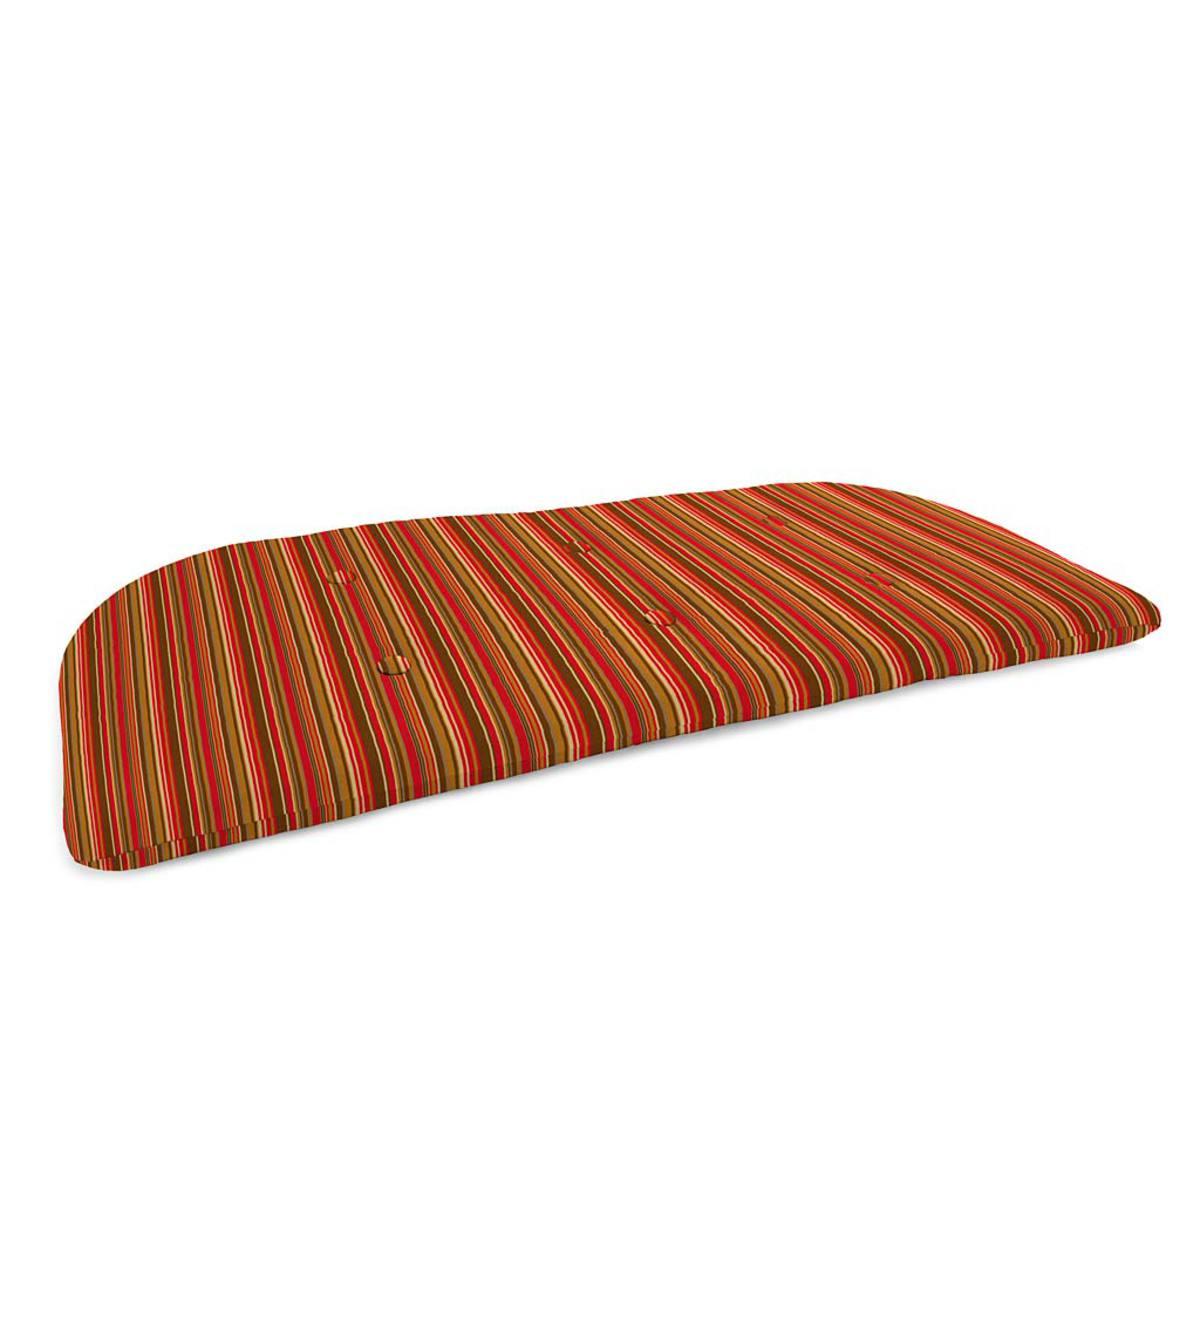 "Sunbrella Classic Tufted Swing/bench Cushion, 41¾"" X 18¾""x 3 Regarding Deluxe Cushion Sunbrella Porch Swings (View 12 of 25)"